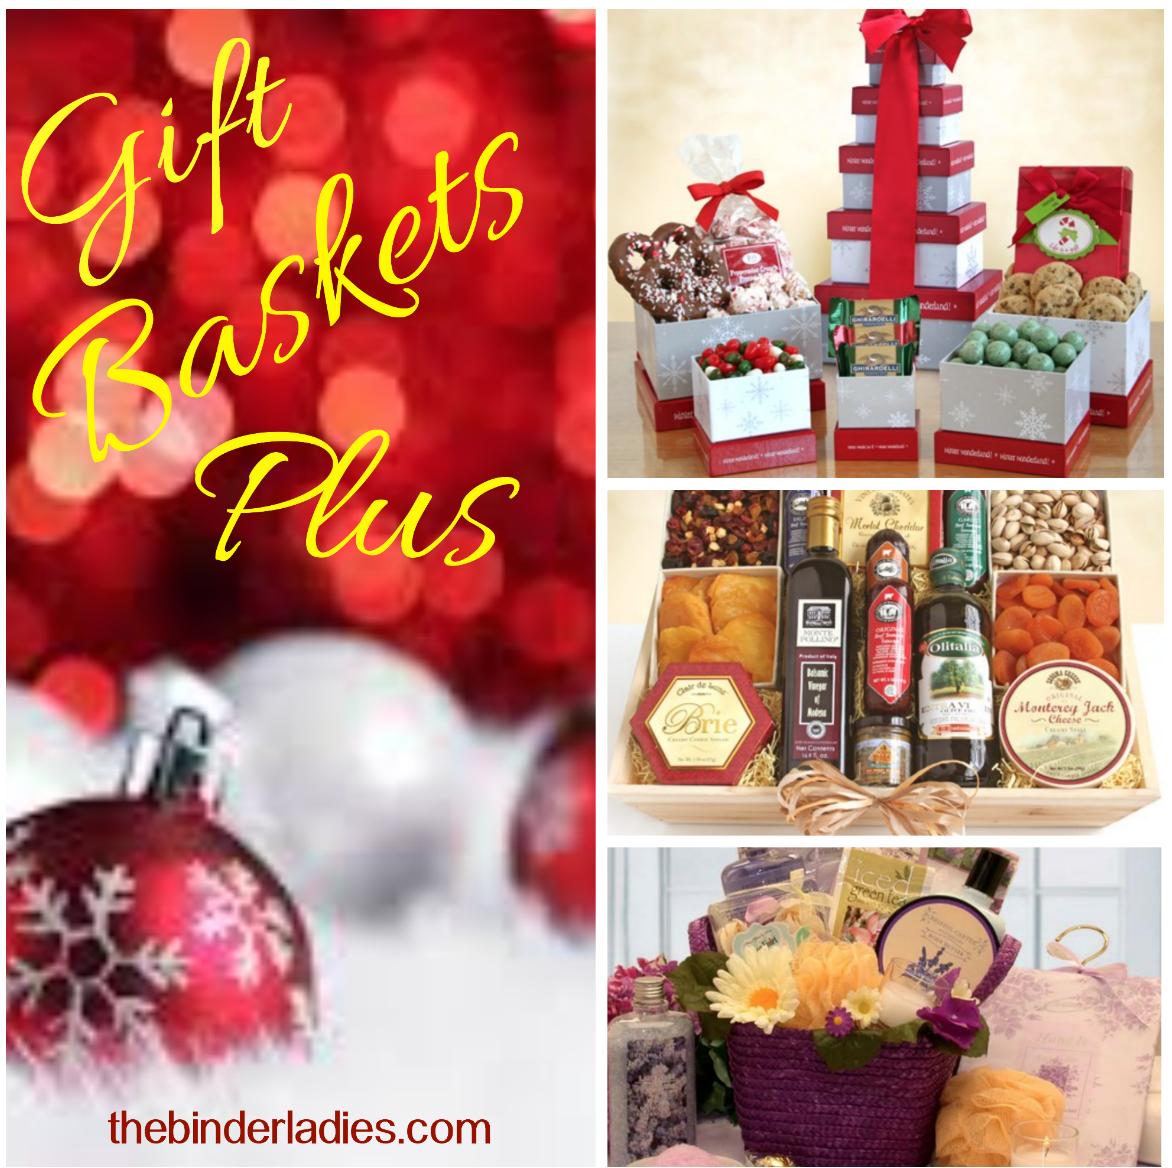 http://www.thebinderladies.com/2014/12/giftbasketplus-com-peppermint.html